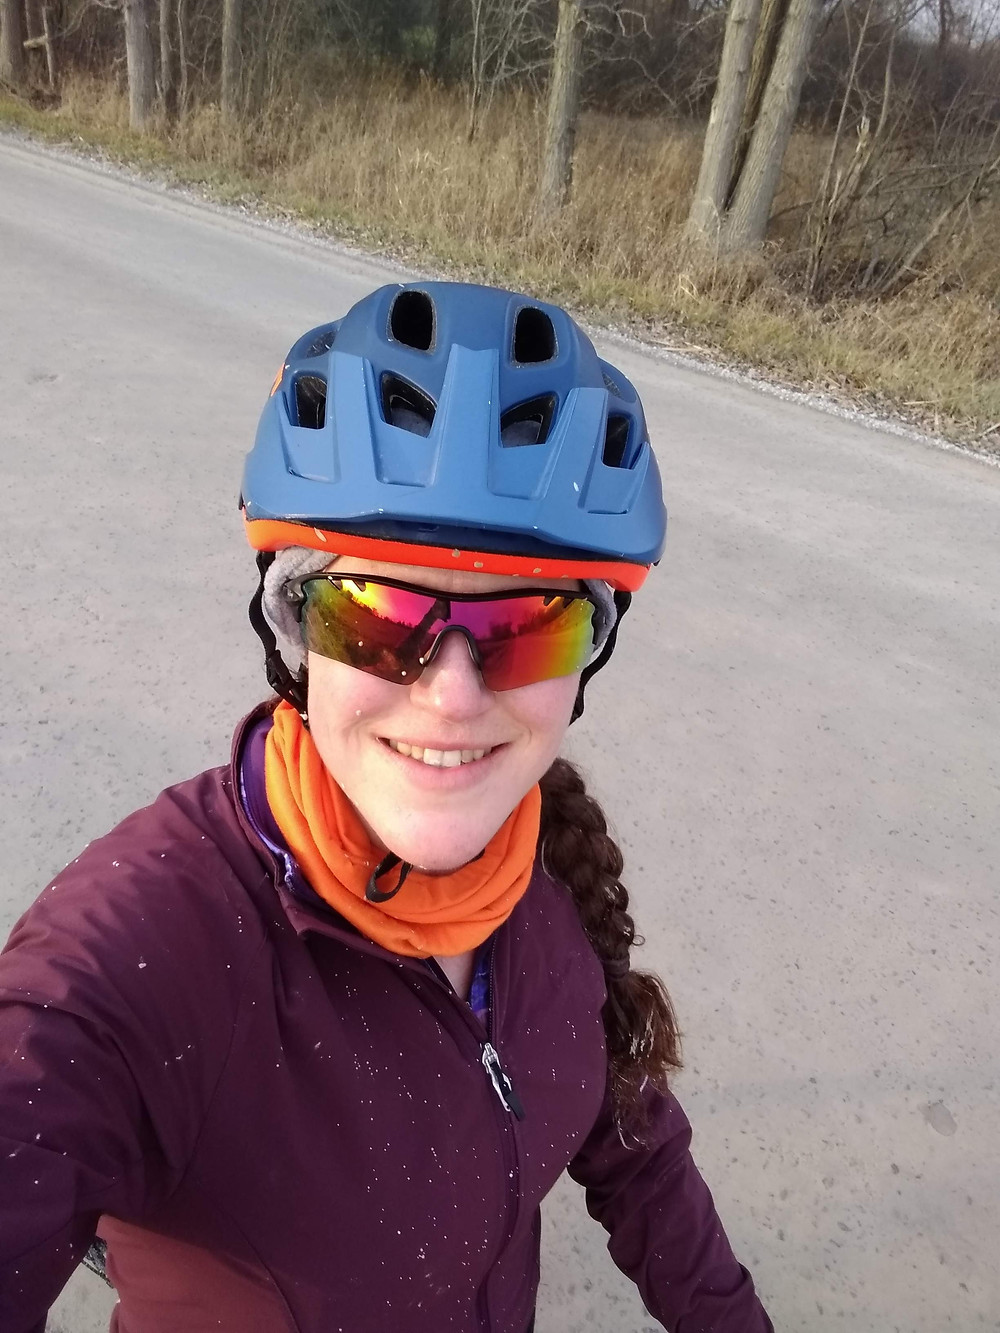 Biking on a dirty road